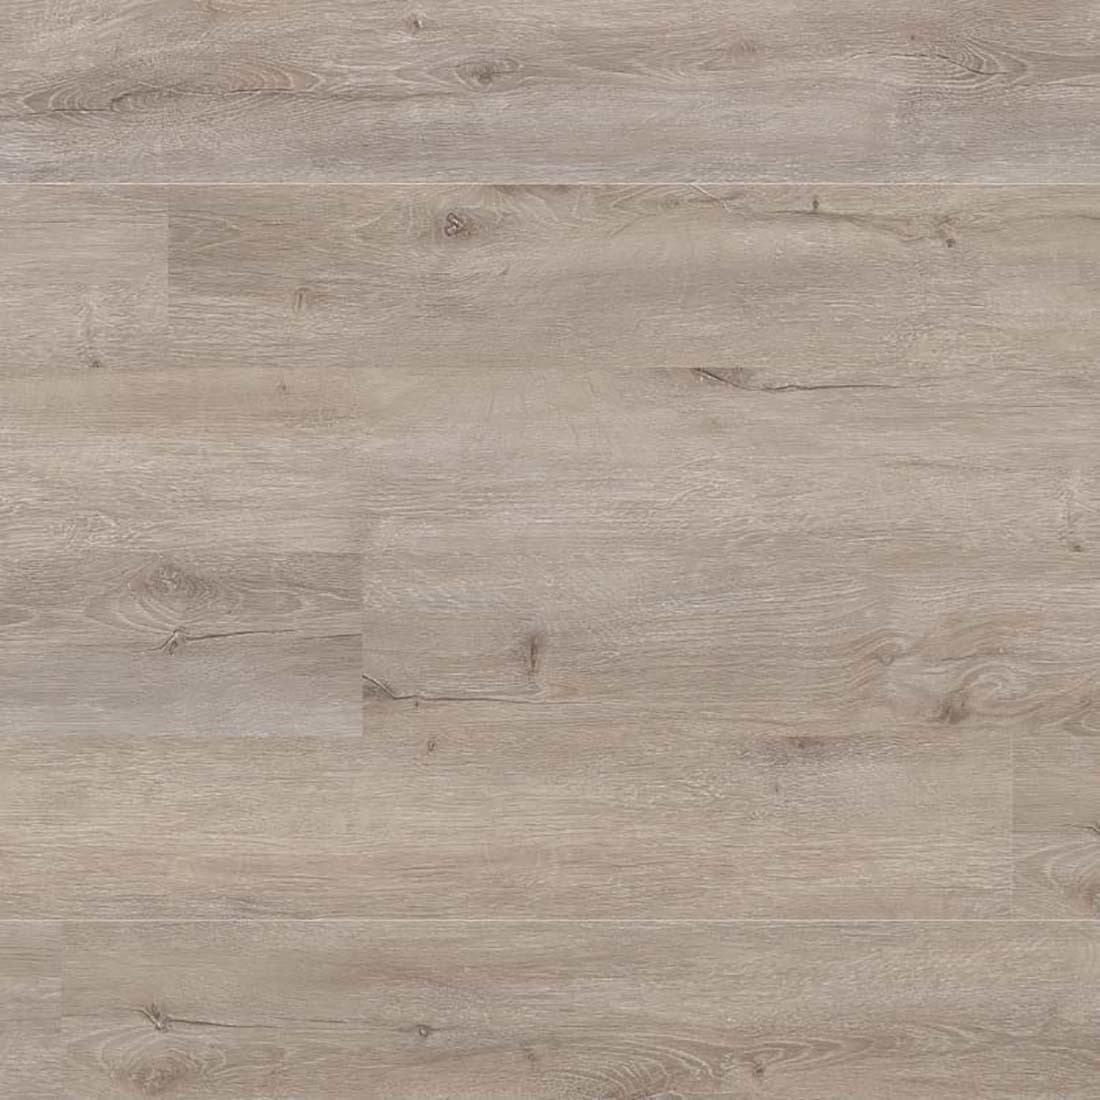 Highland Grove / 2mm / PVC / Glue Down Vinyl Planks - 2mm PVC Glue Down - Heritage Collection 0